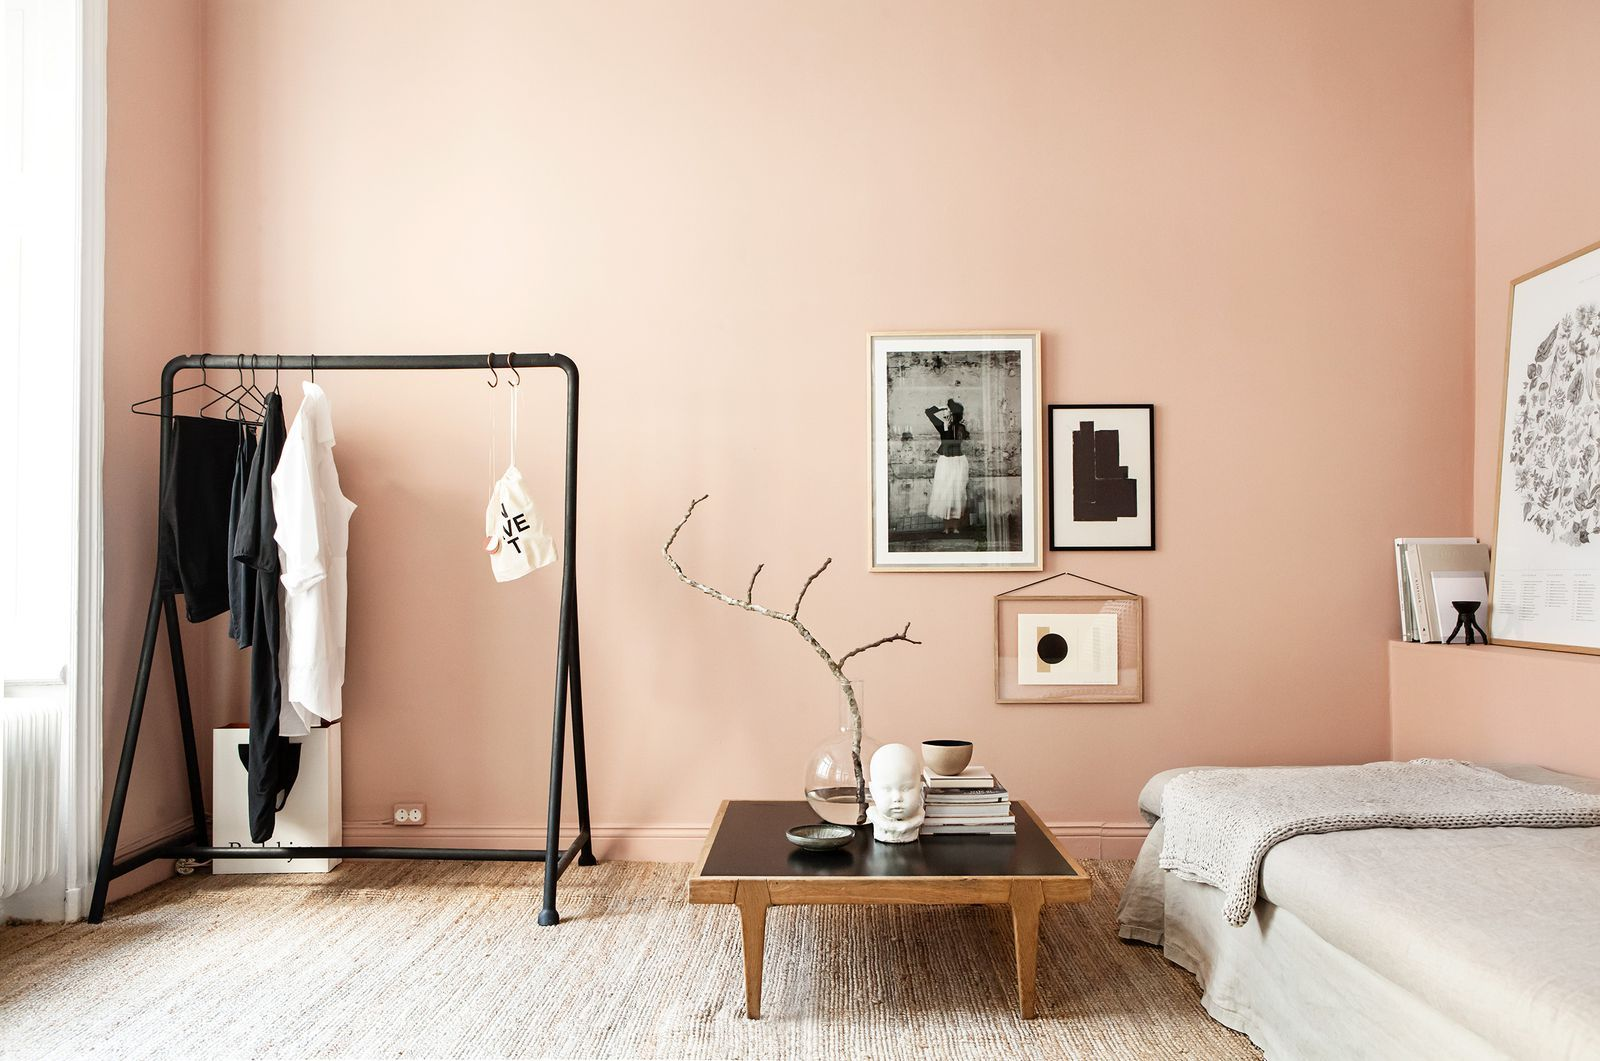 24 Lovely Bedroom Colors That Ll Make You Wake Up Happier Minimalism Interior Minimal Interior Design Interior Design Inspiration